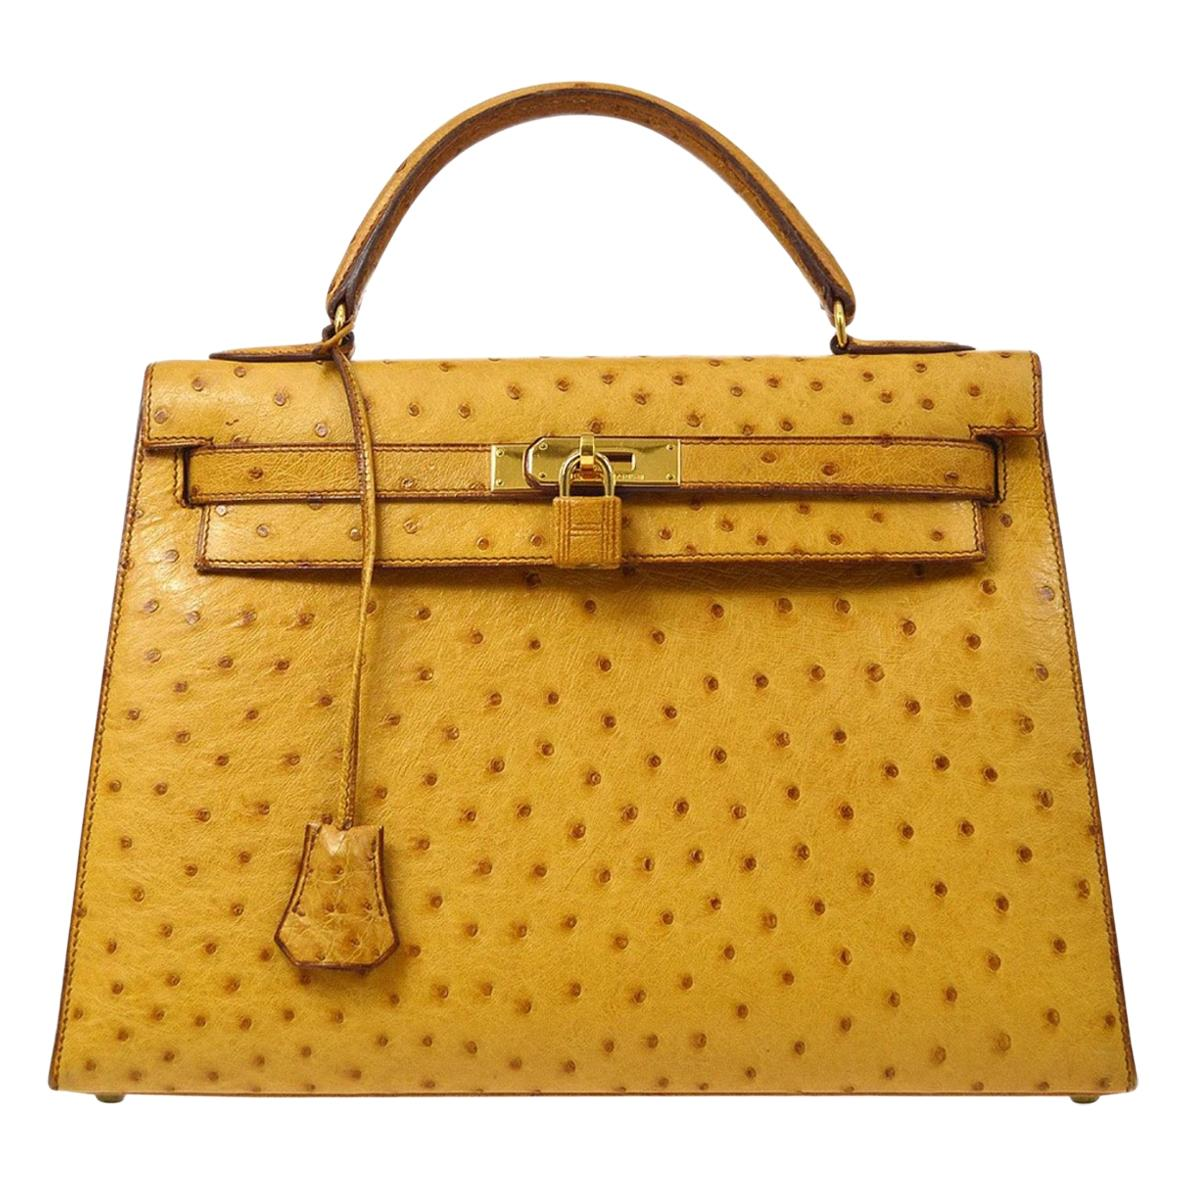 Hermes Kelly 32 Ostrich Exotic Yellow Gold Top Handle Satchel Shoulder Bag